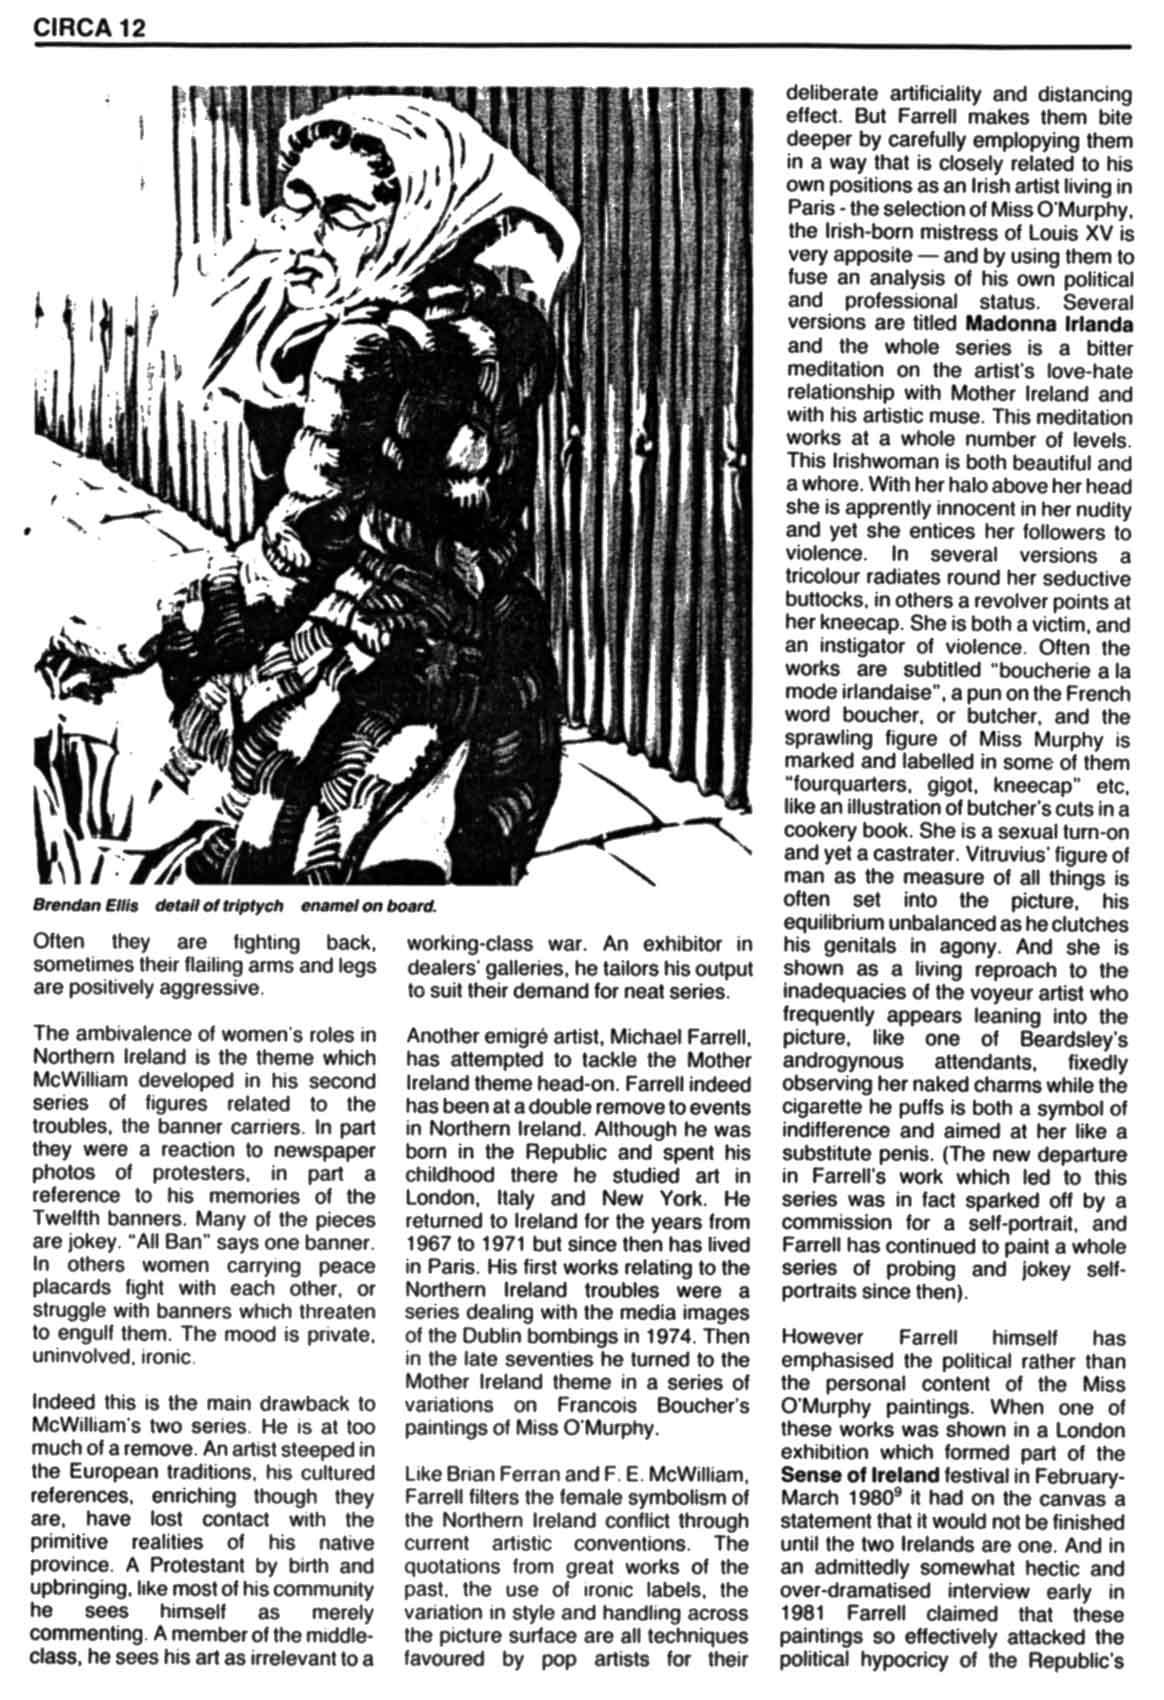 Issue 1: November / December 1981, p. 12